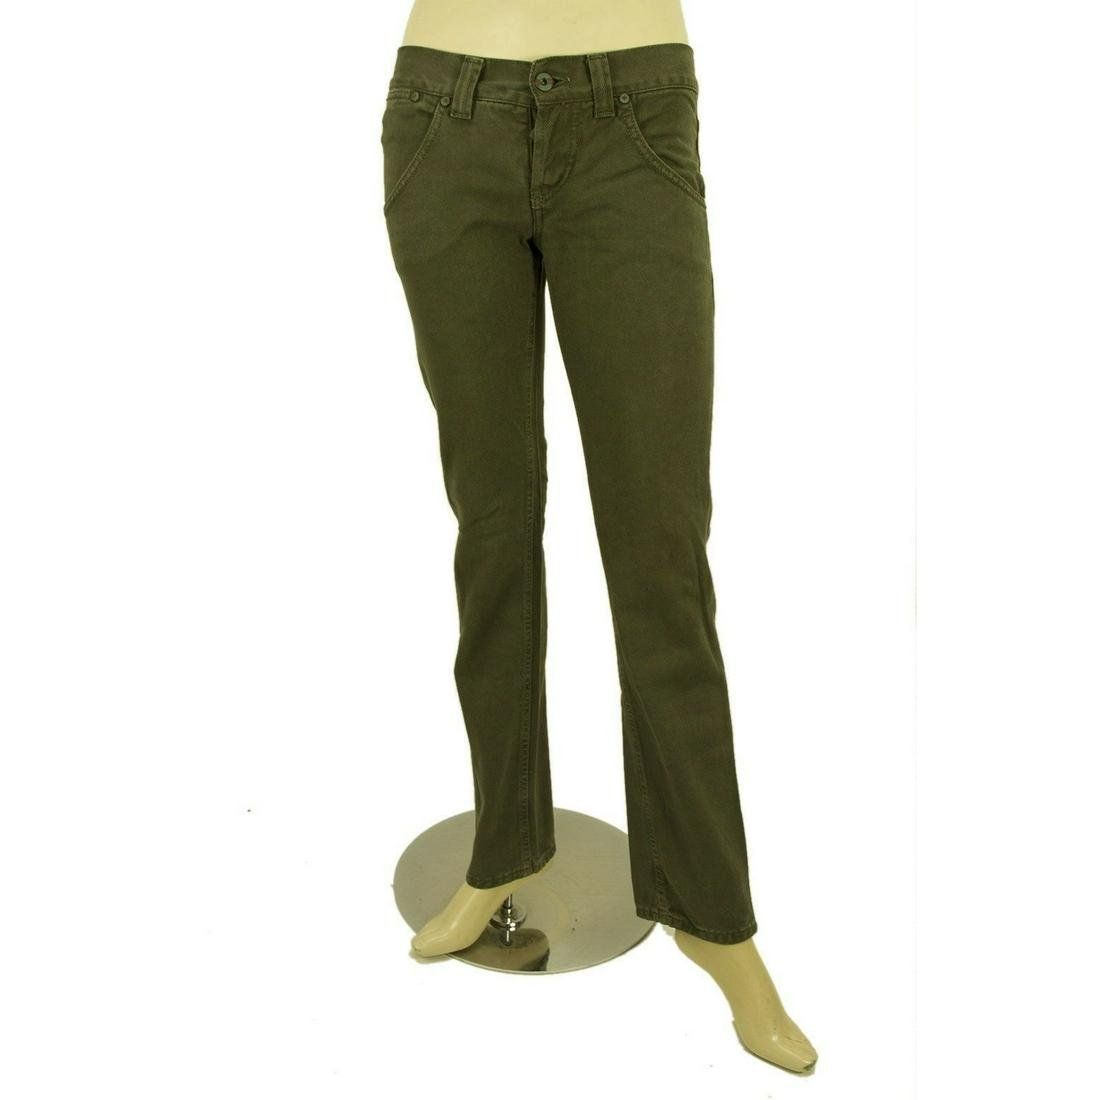 Dondup Olive Green Denim Jeans Slim Trousers Pants sz